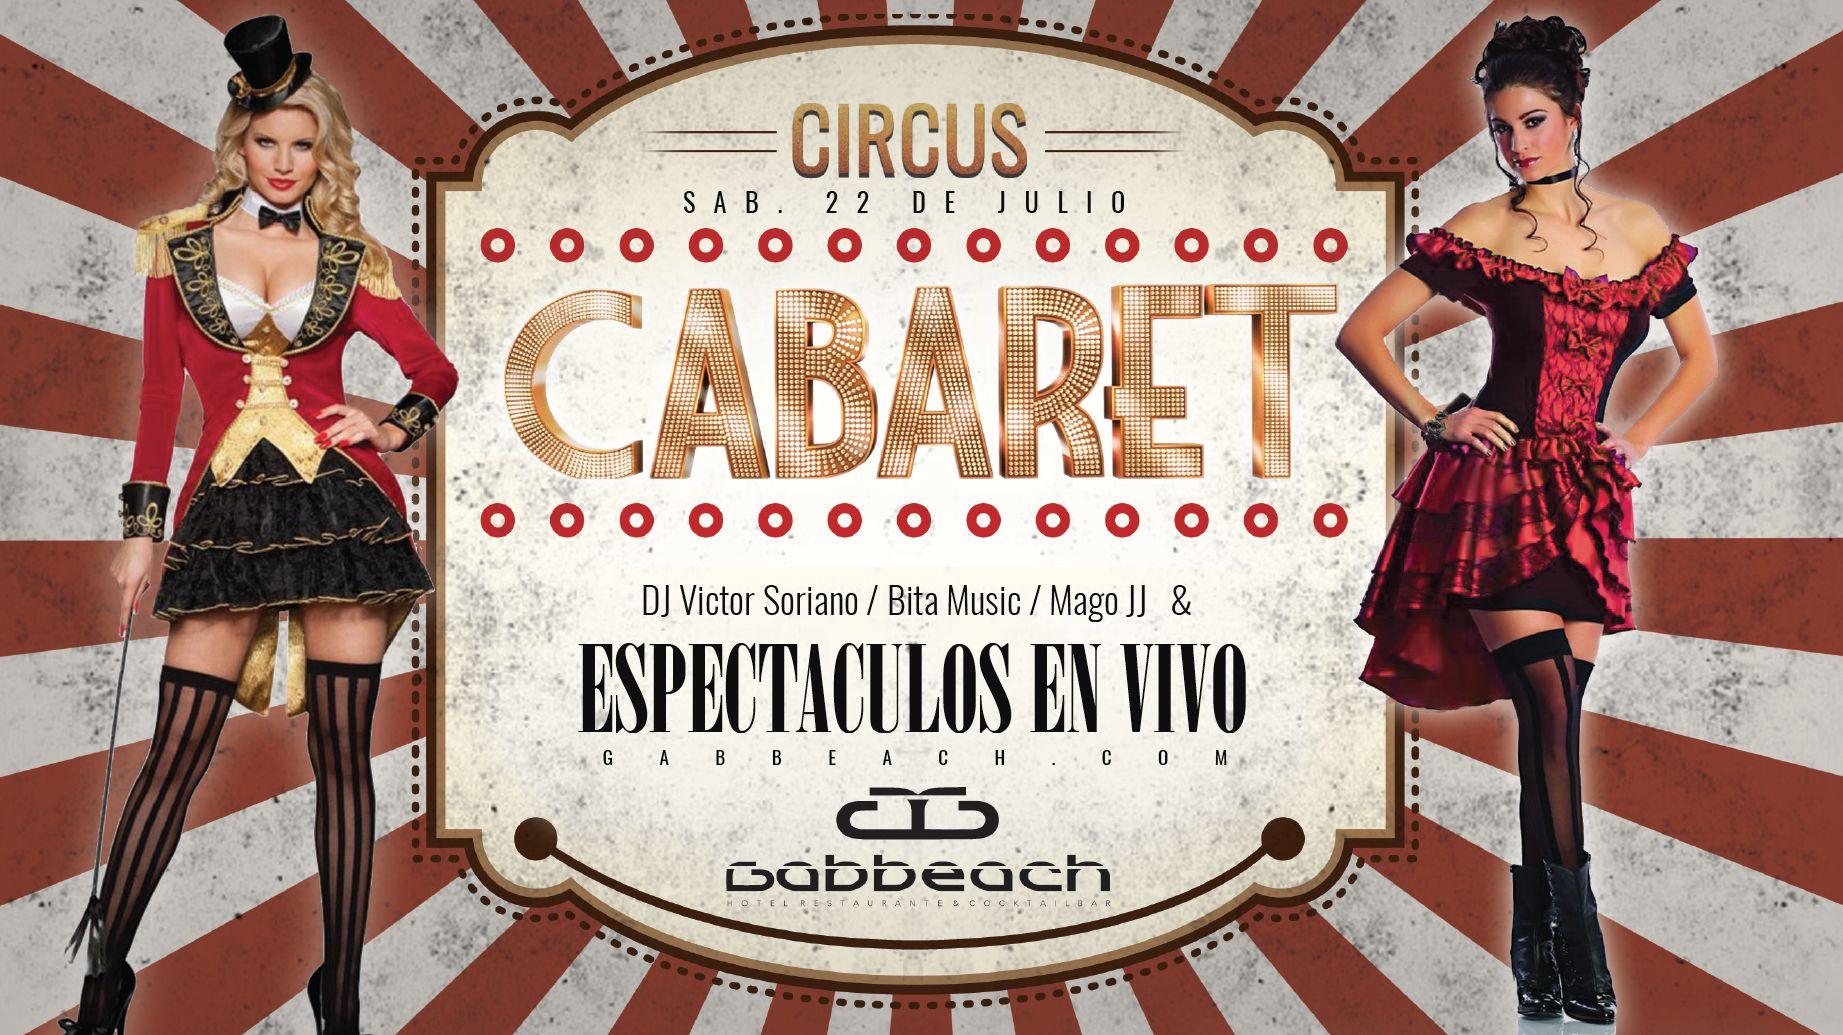 Circus Cabaret dinner show Valencia & party 2017